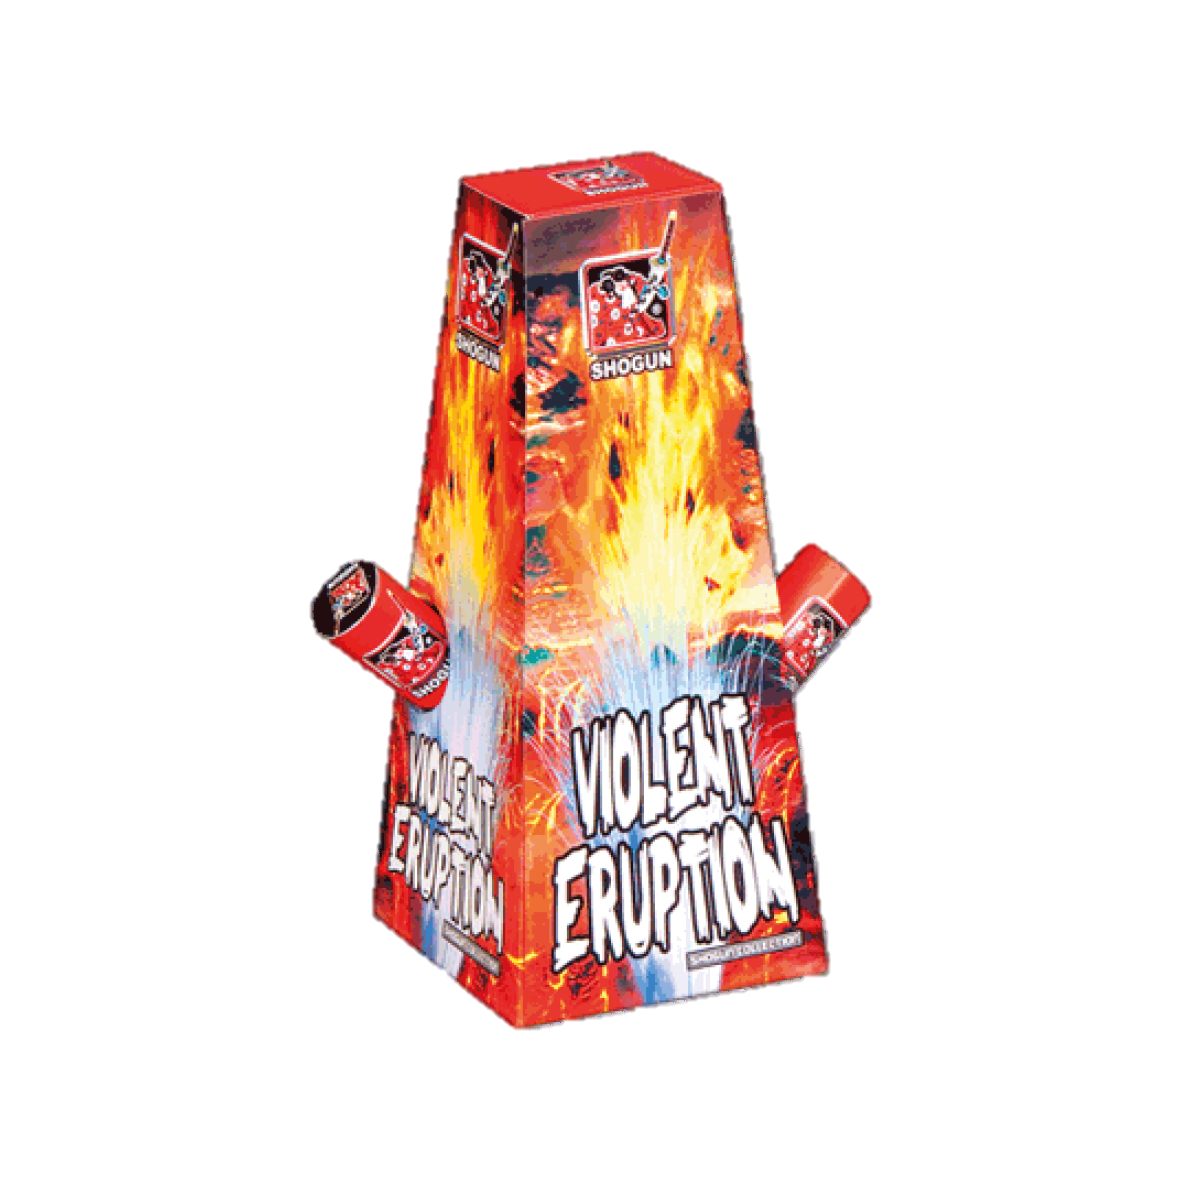 Violant Eruption